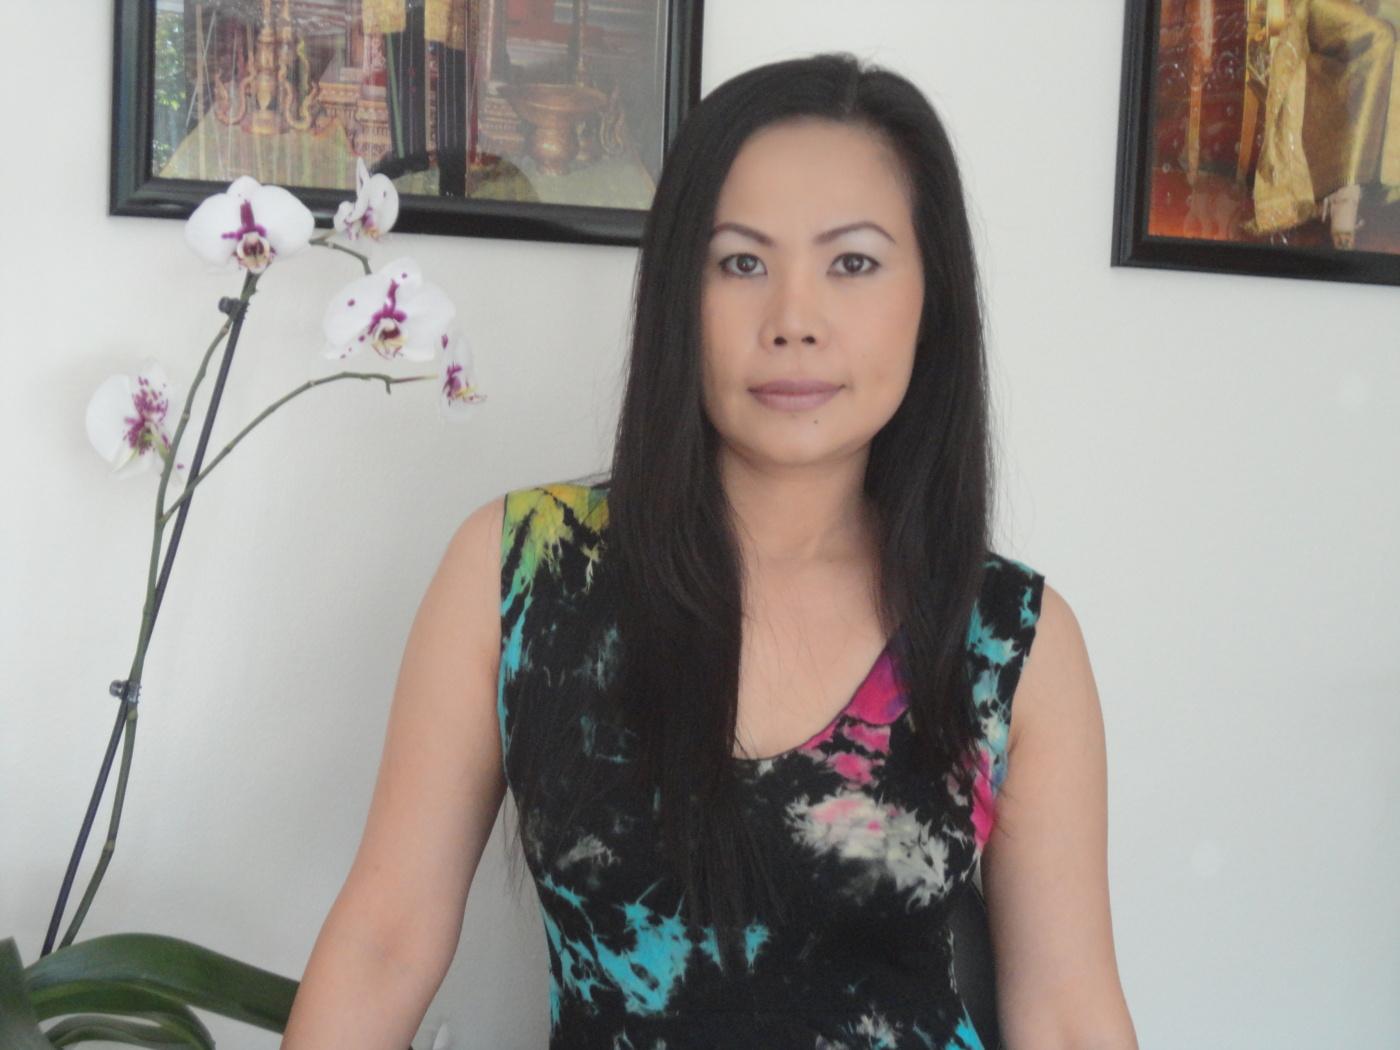 escort annoncer bedste thai massage